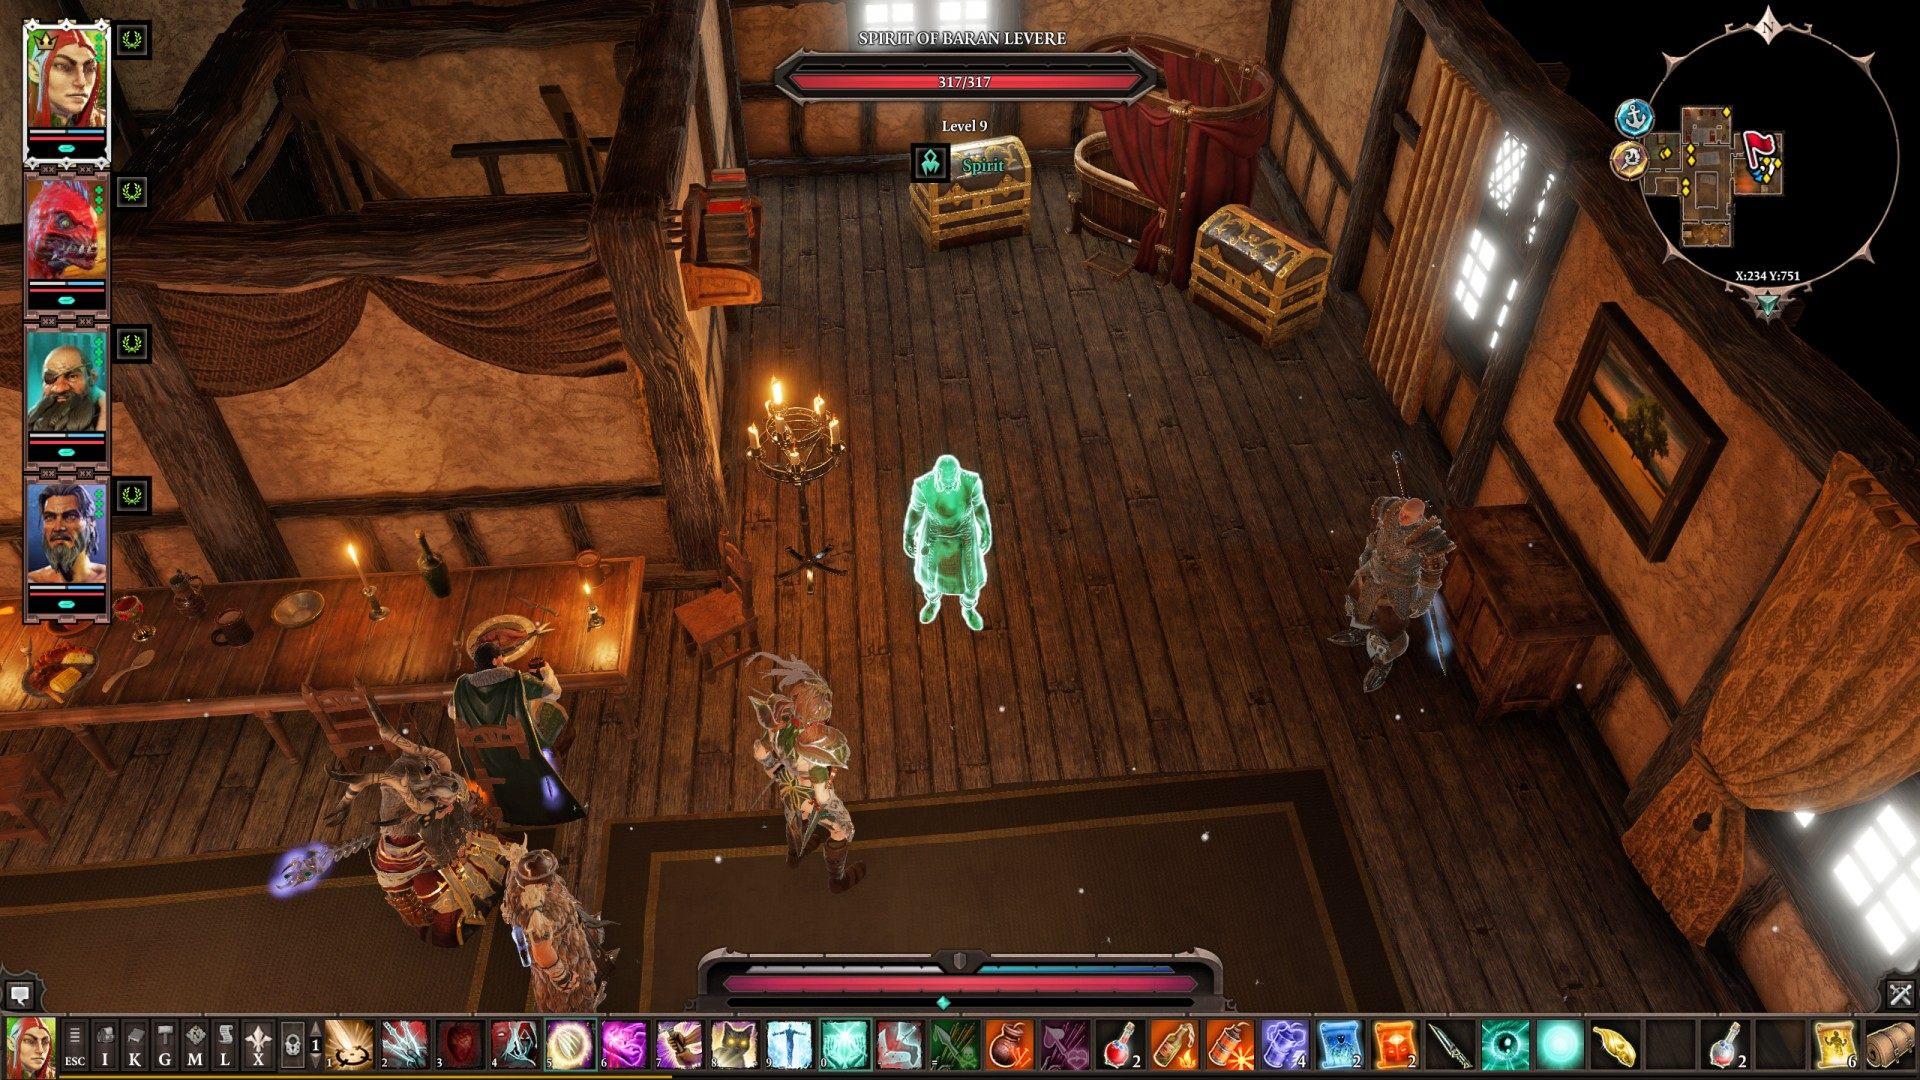 The Merchant, Divinity: Original Sin 2 Quest